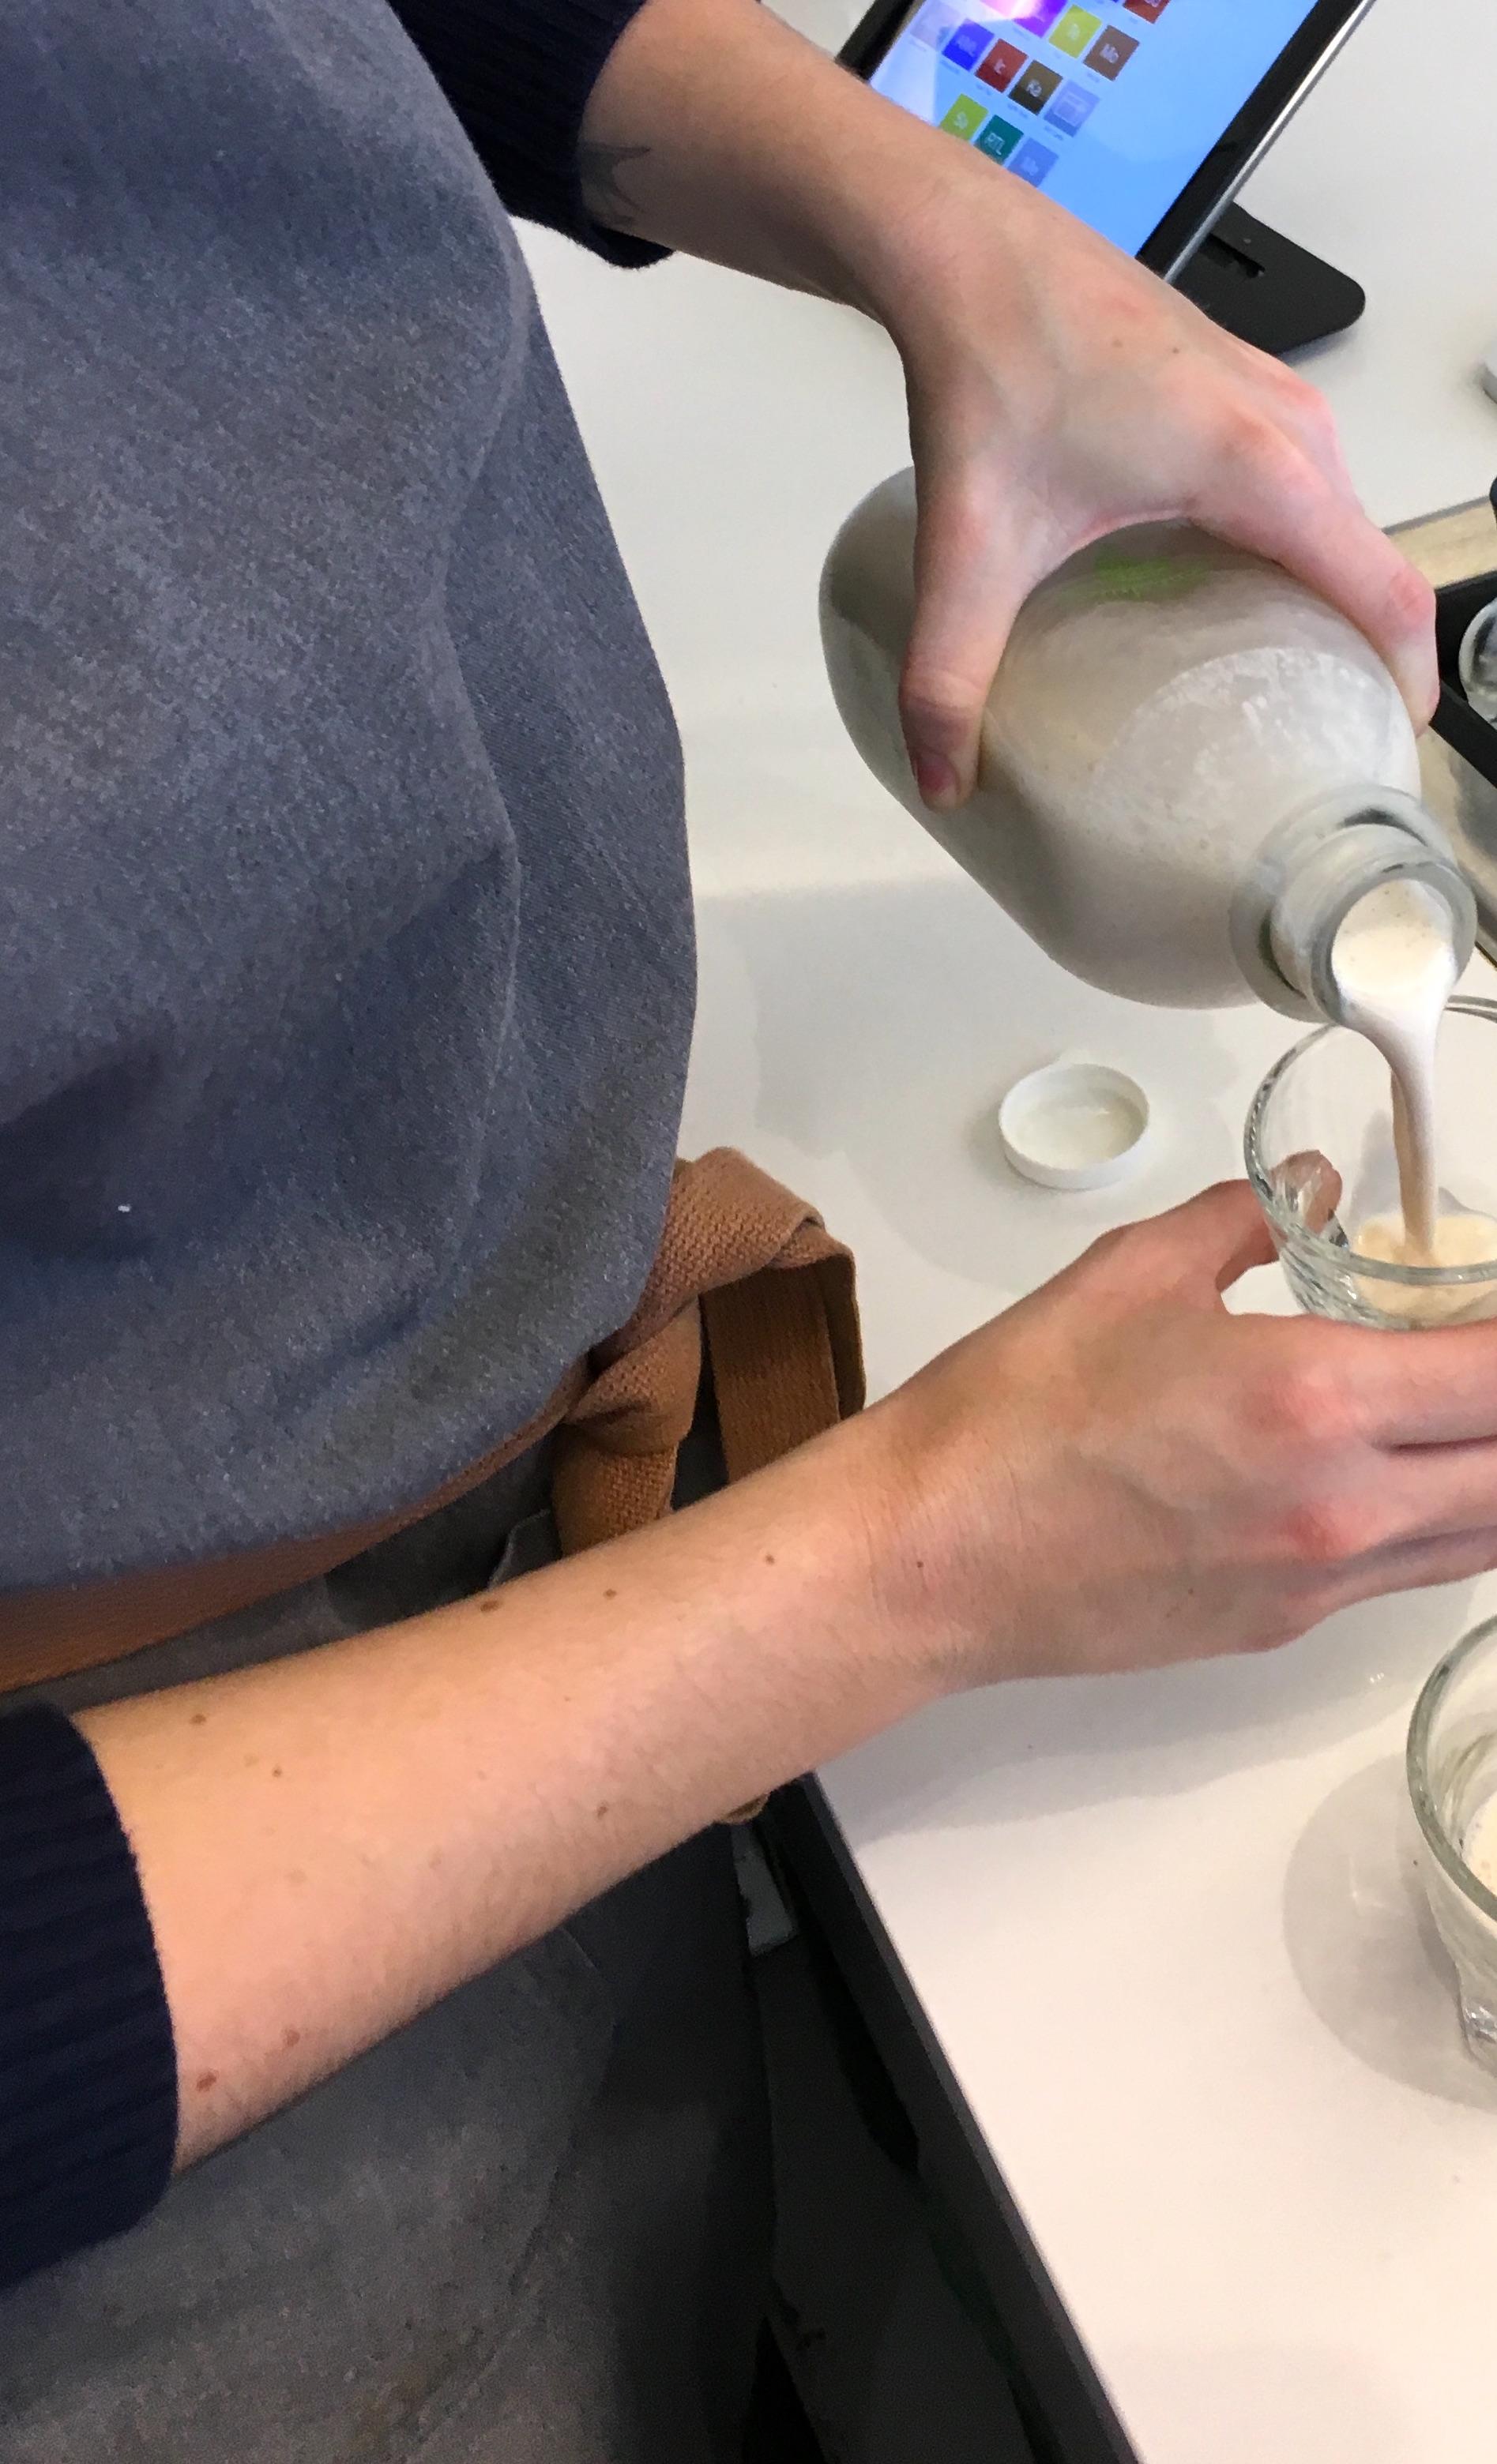 Initial Taste Test at Refrigerated Temperature